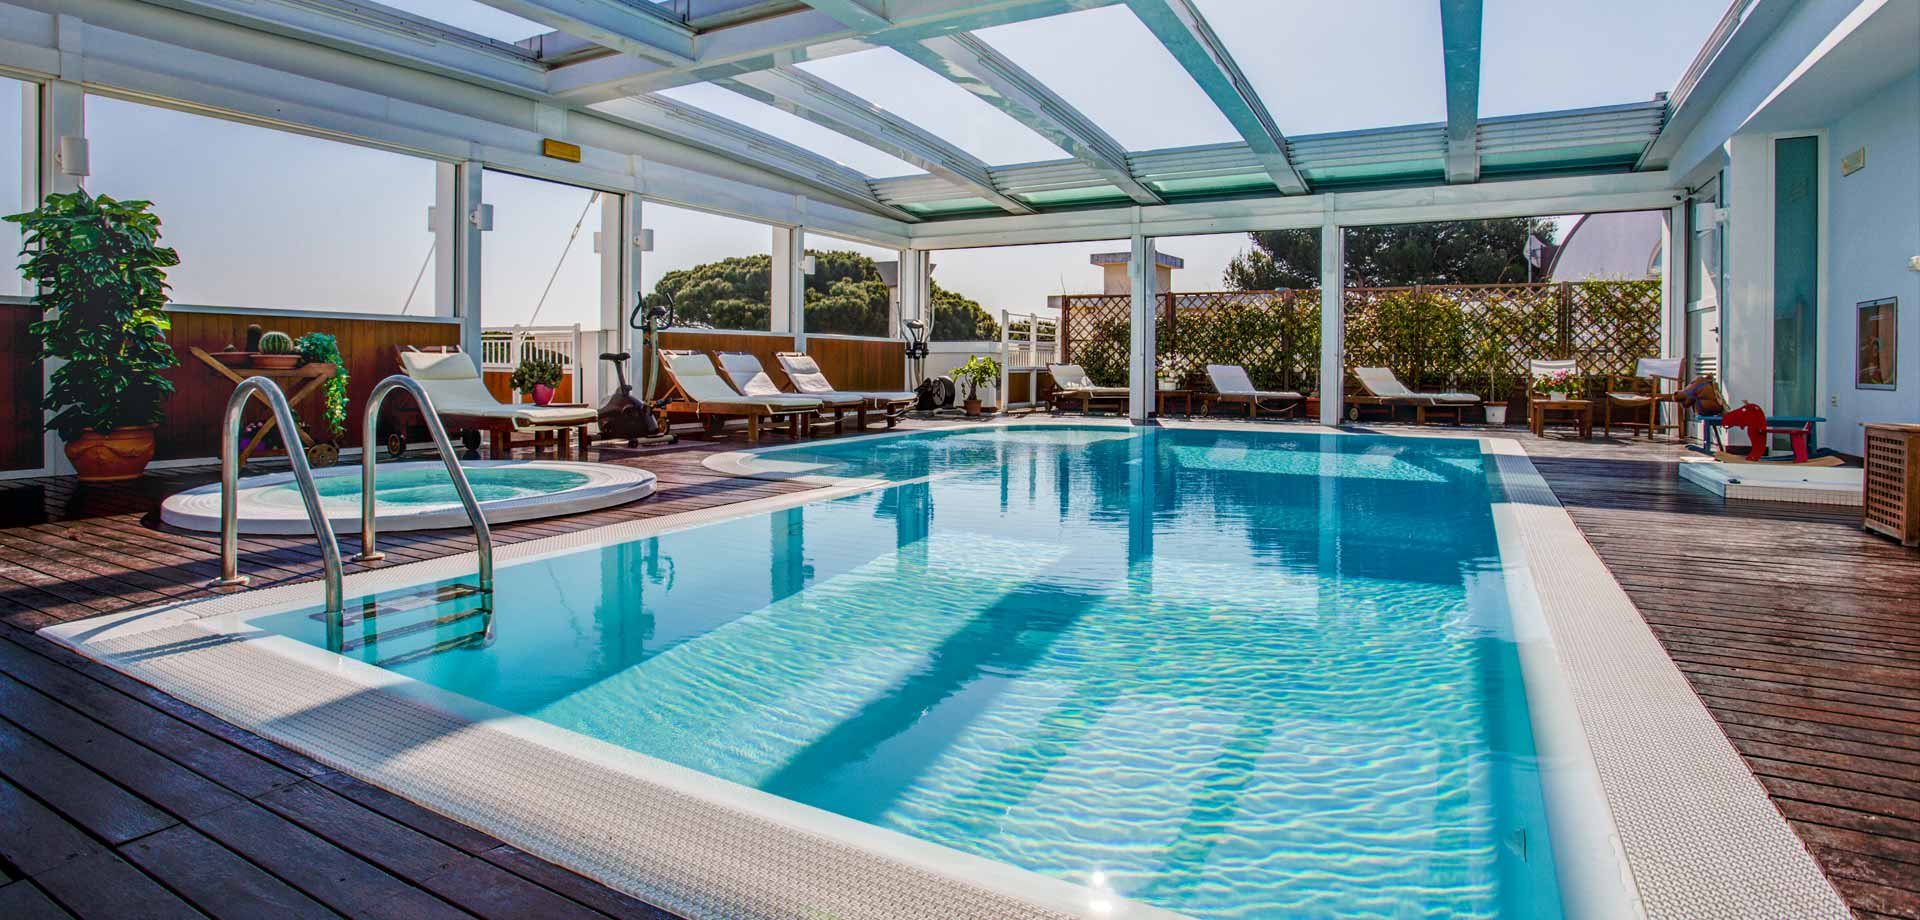 Piscina panoramica aparthotel england - Hotel riccione con piscina coperta ...